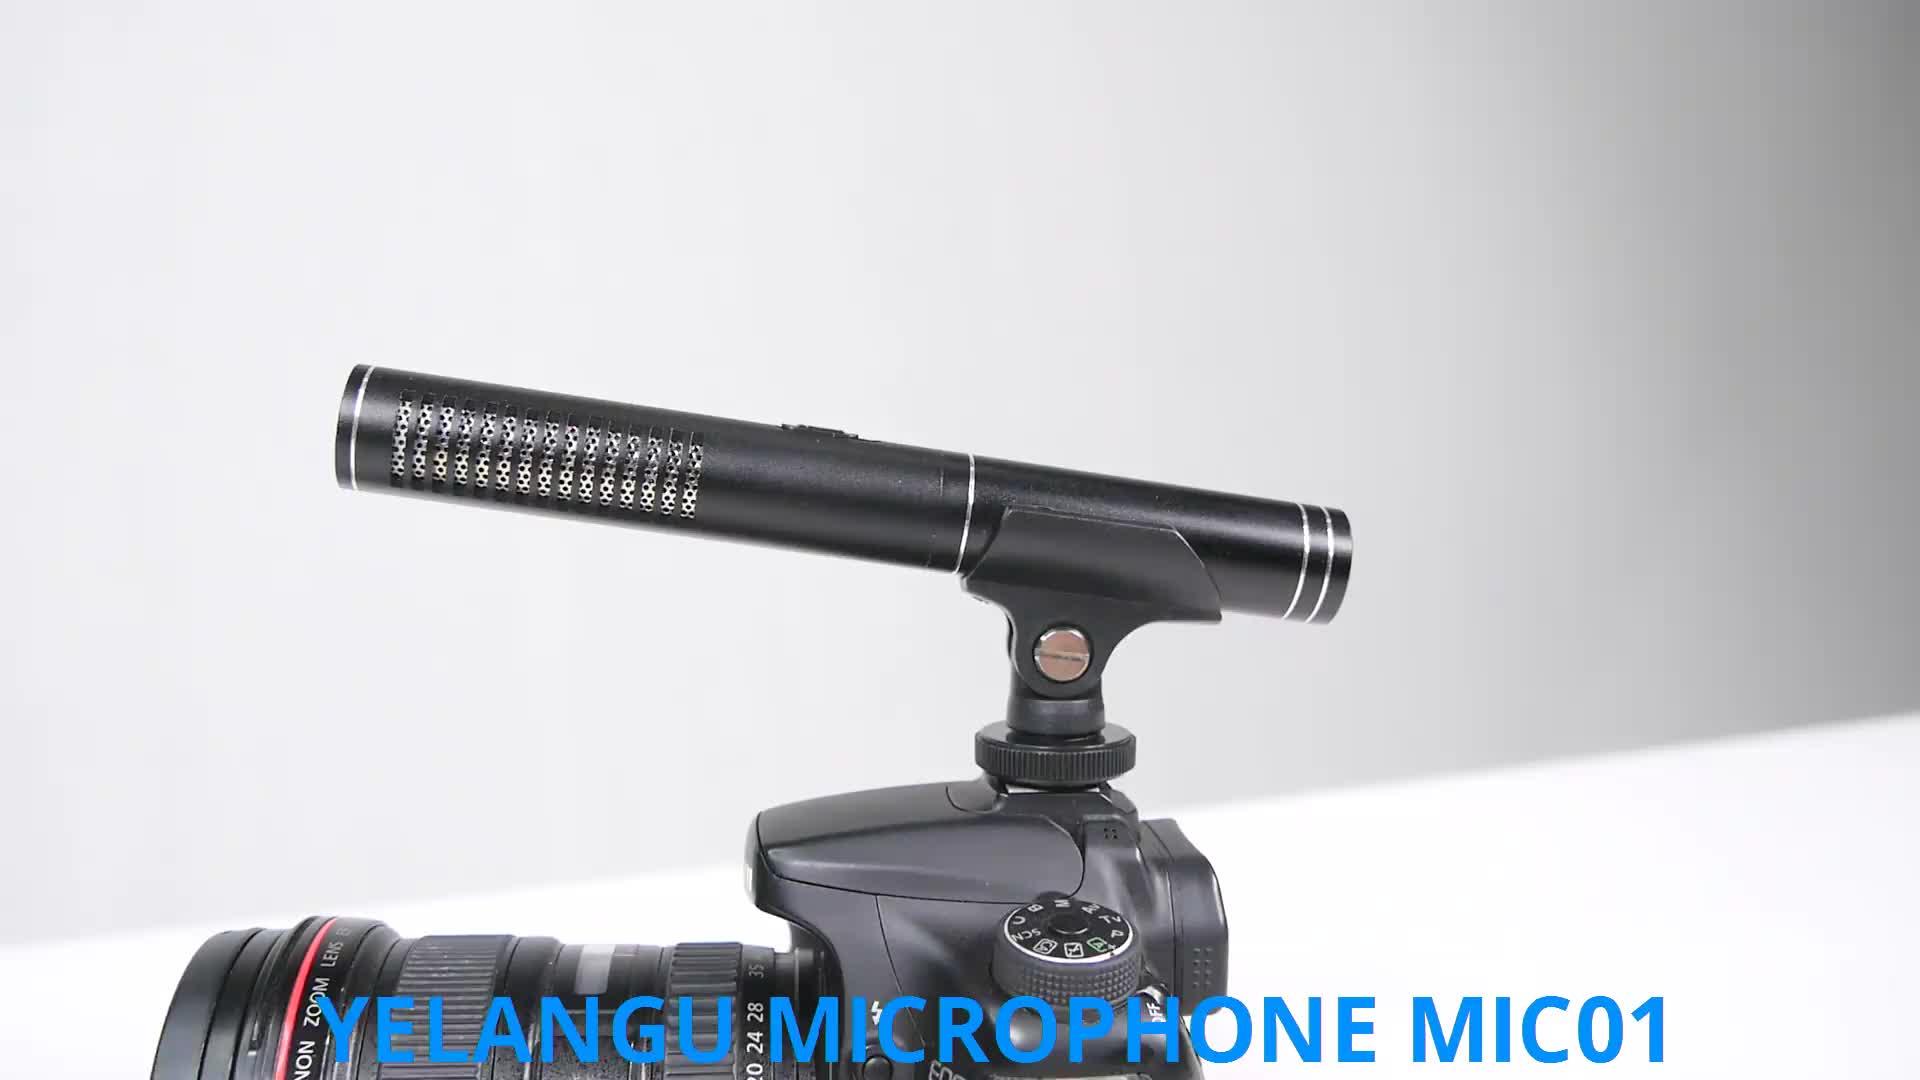 Yelangu Film Recording Microphone Dslr Smartphone Video Camera Microphone